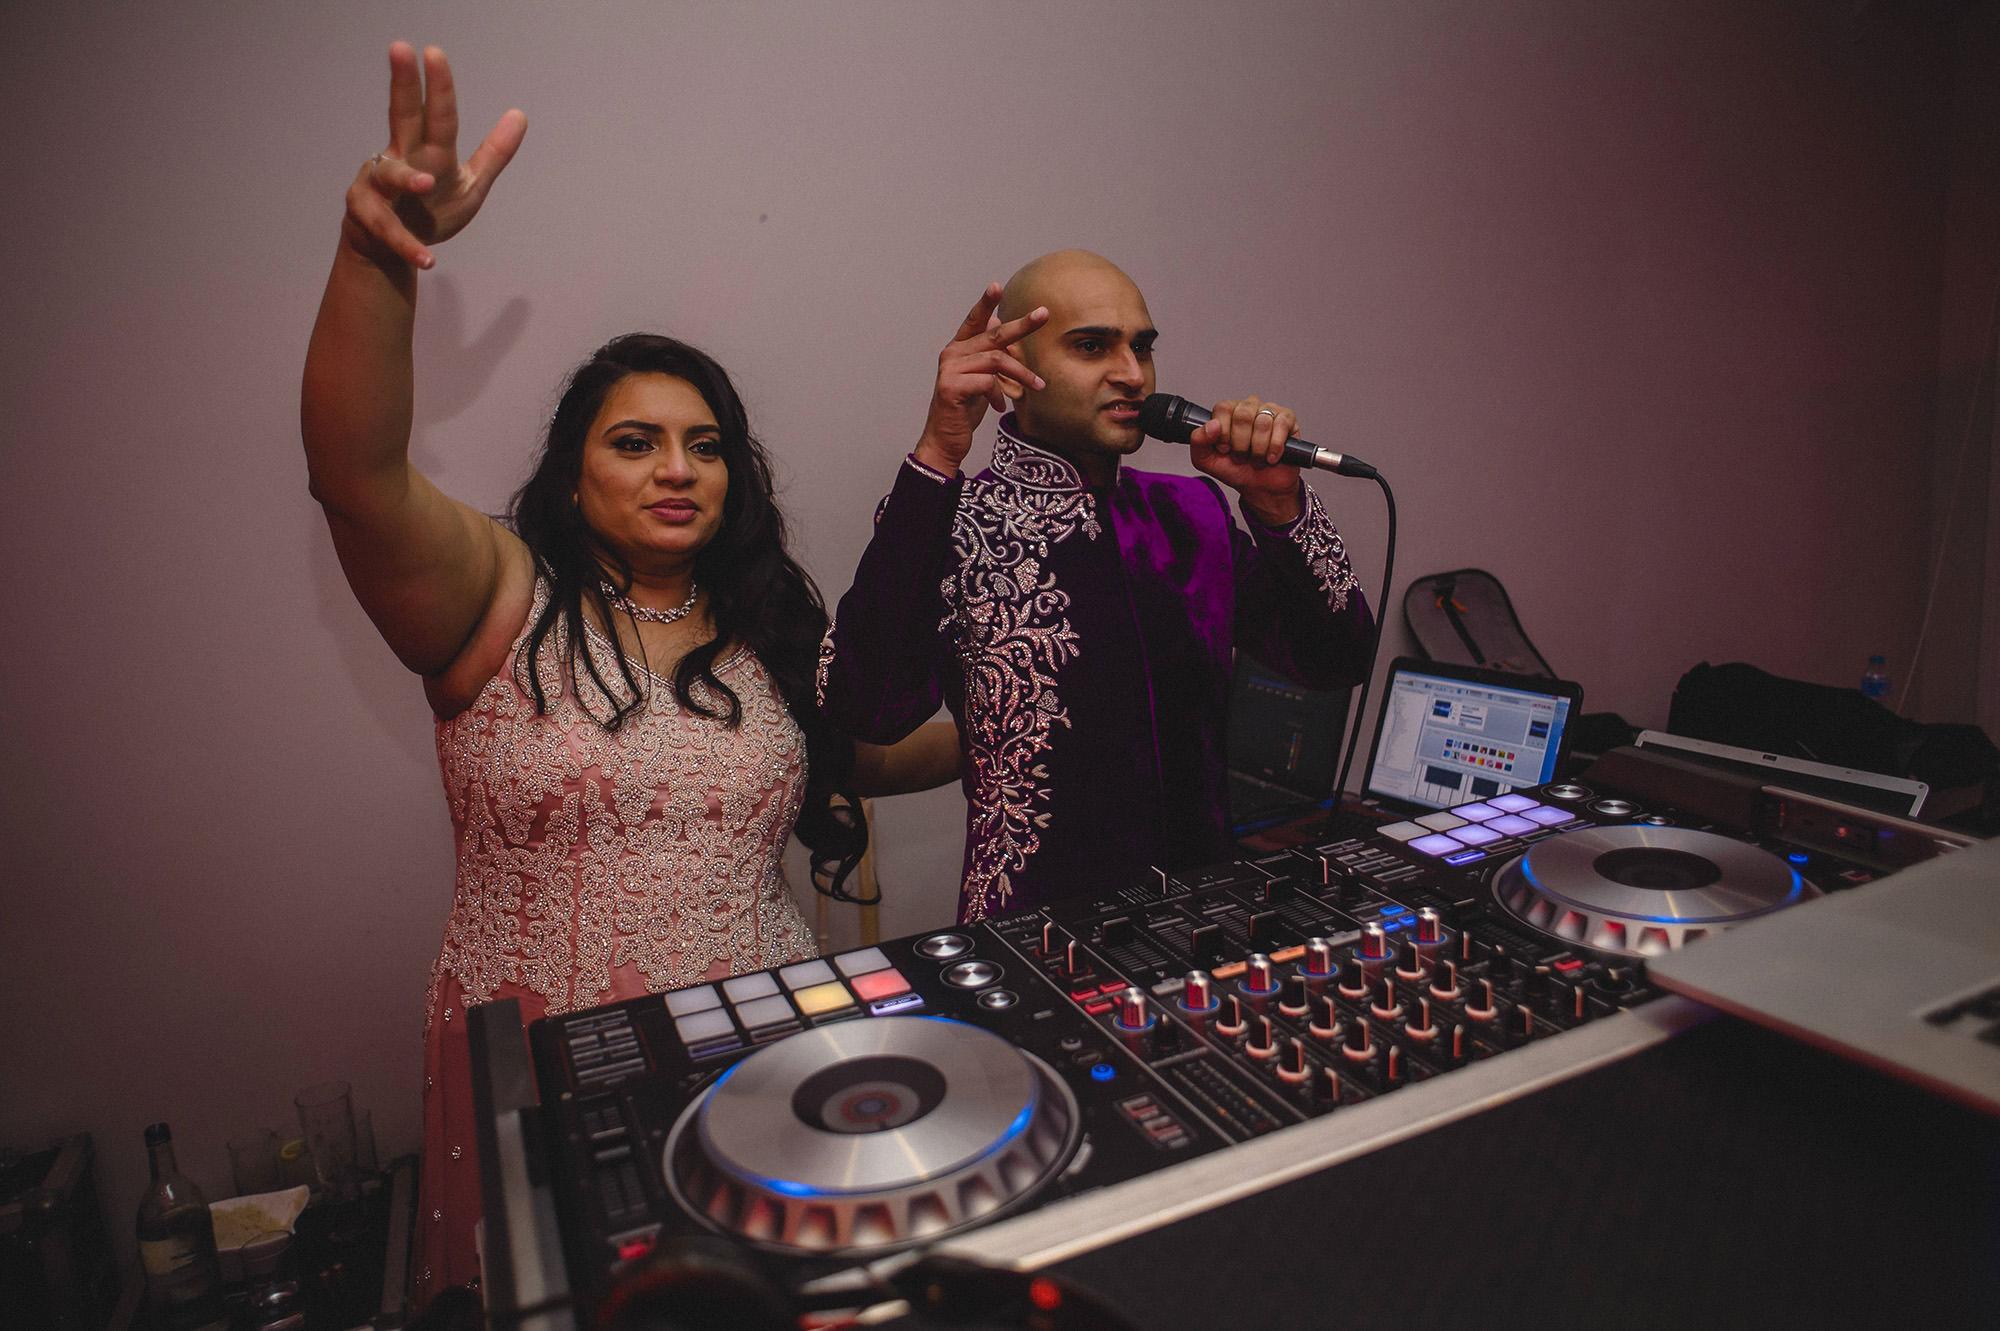 bride and groom using the DJ decks